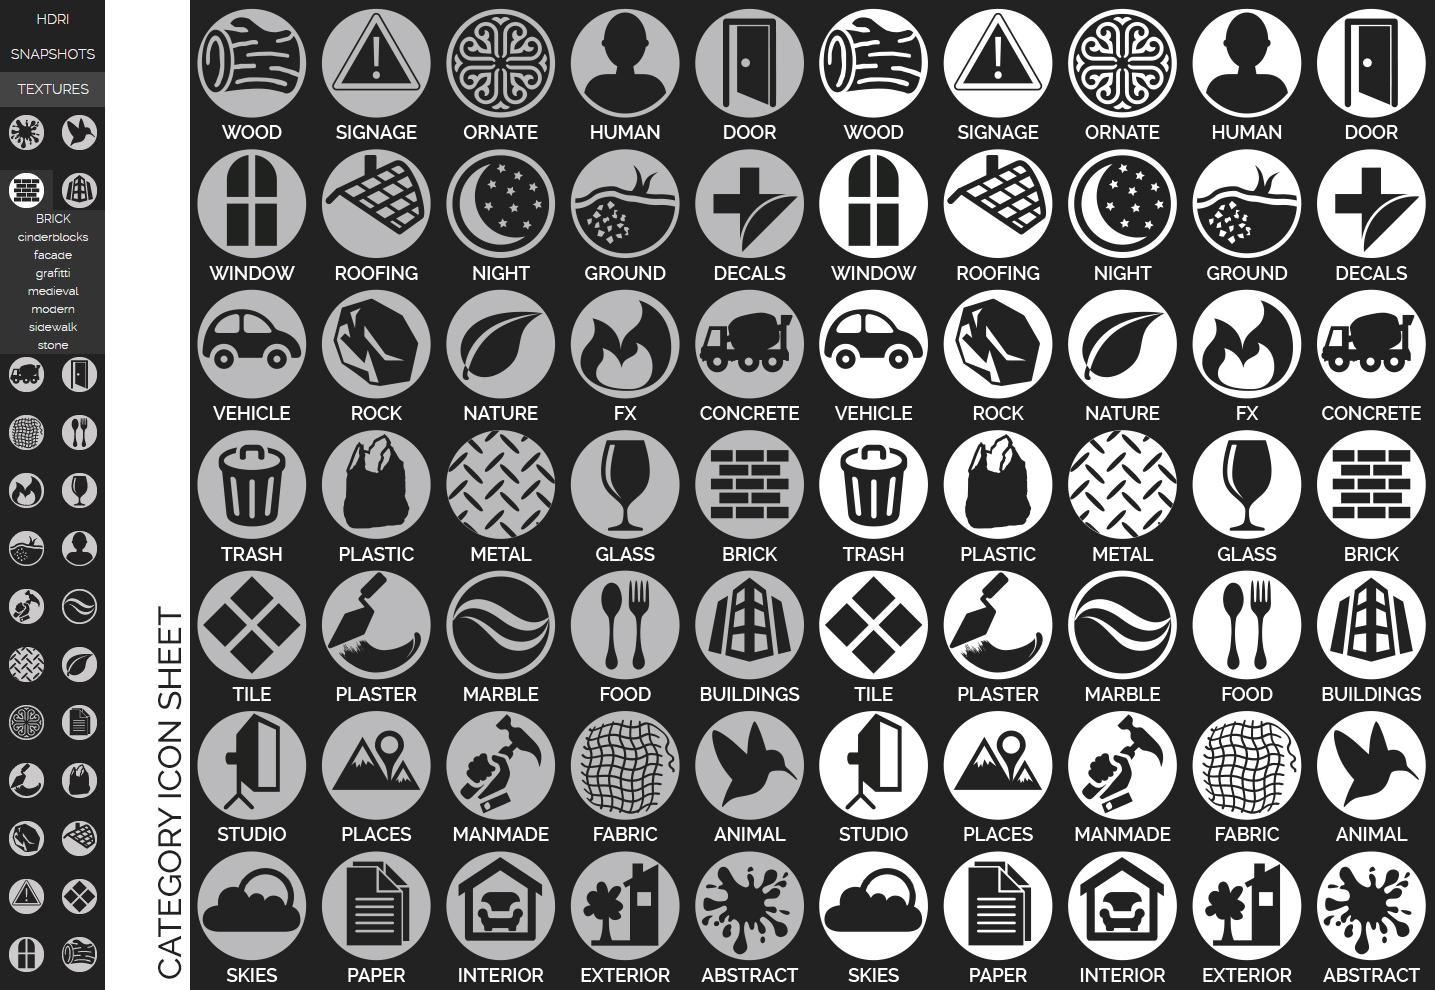 Category Icon Sheet